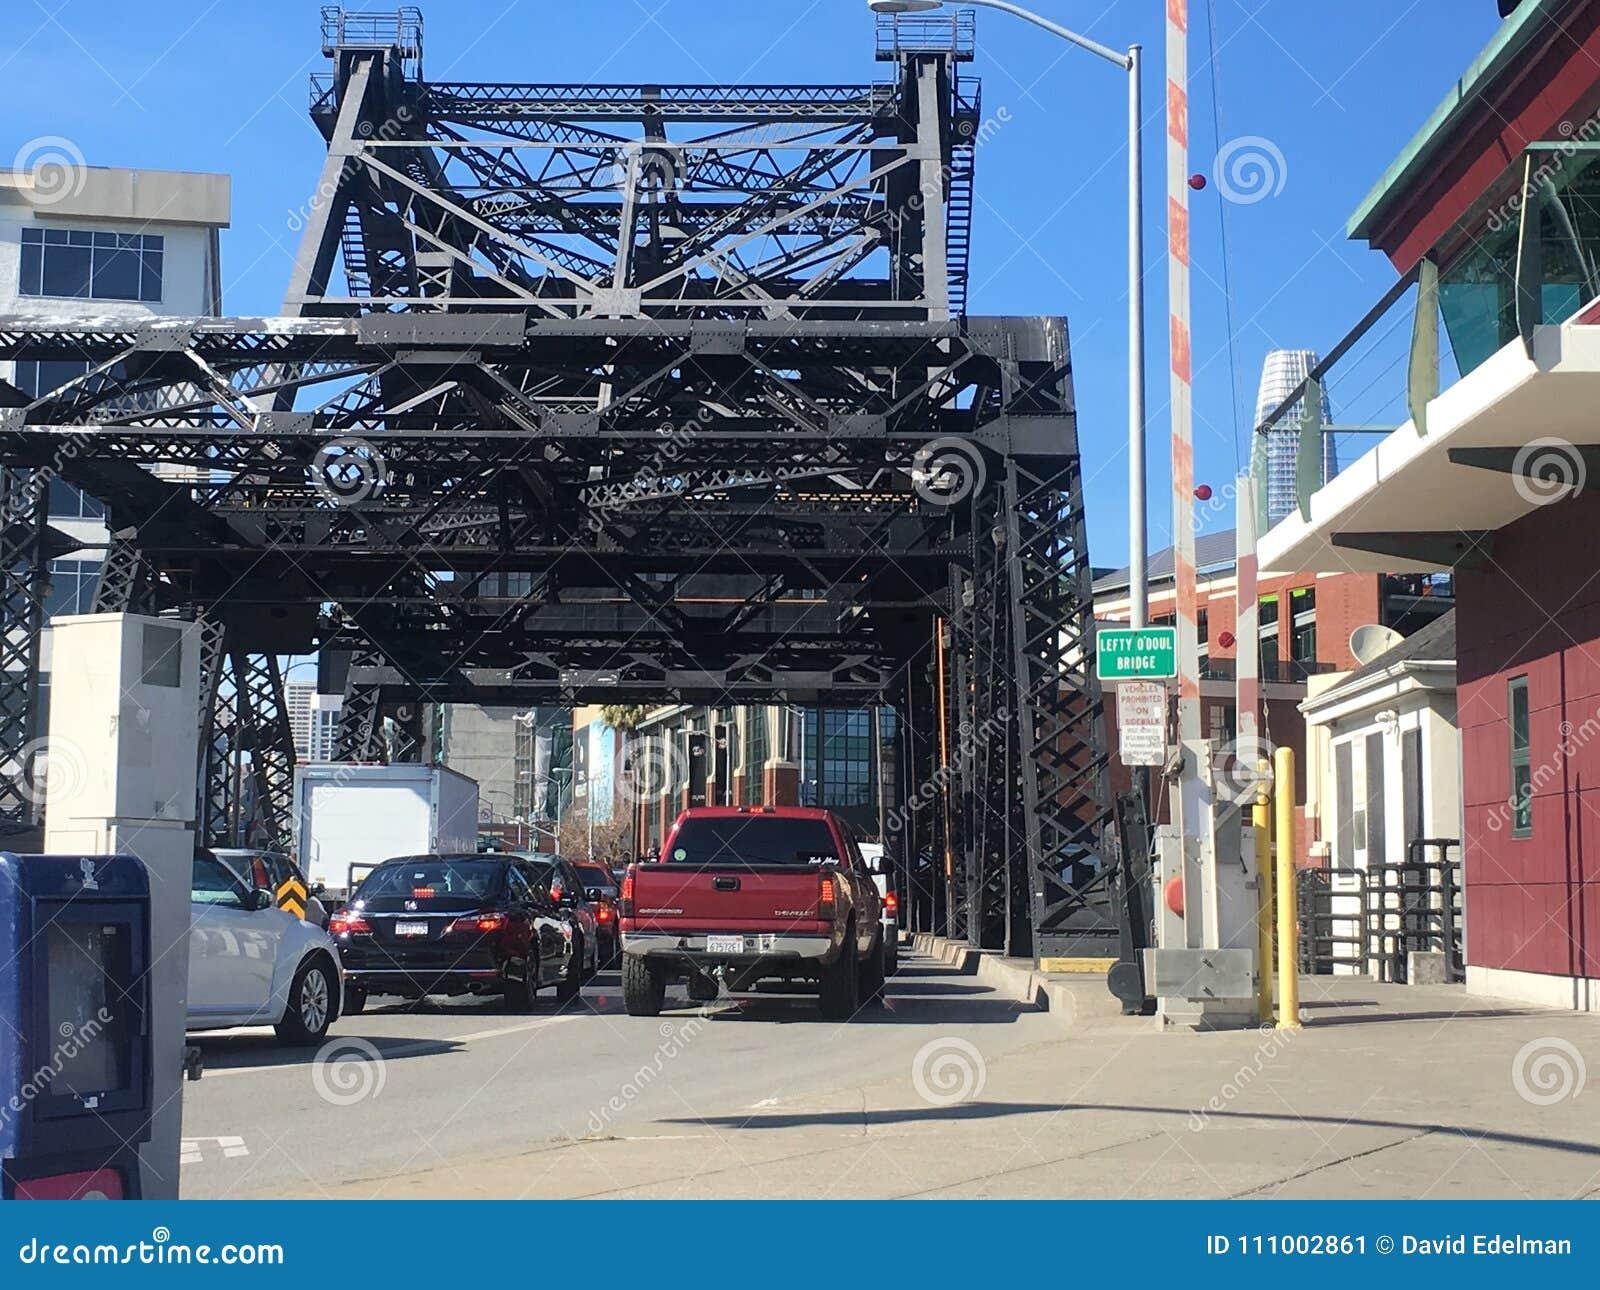 Car traffic using the Lefty O Doul bridge, with bridge sign name shown.